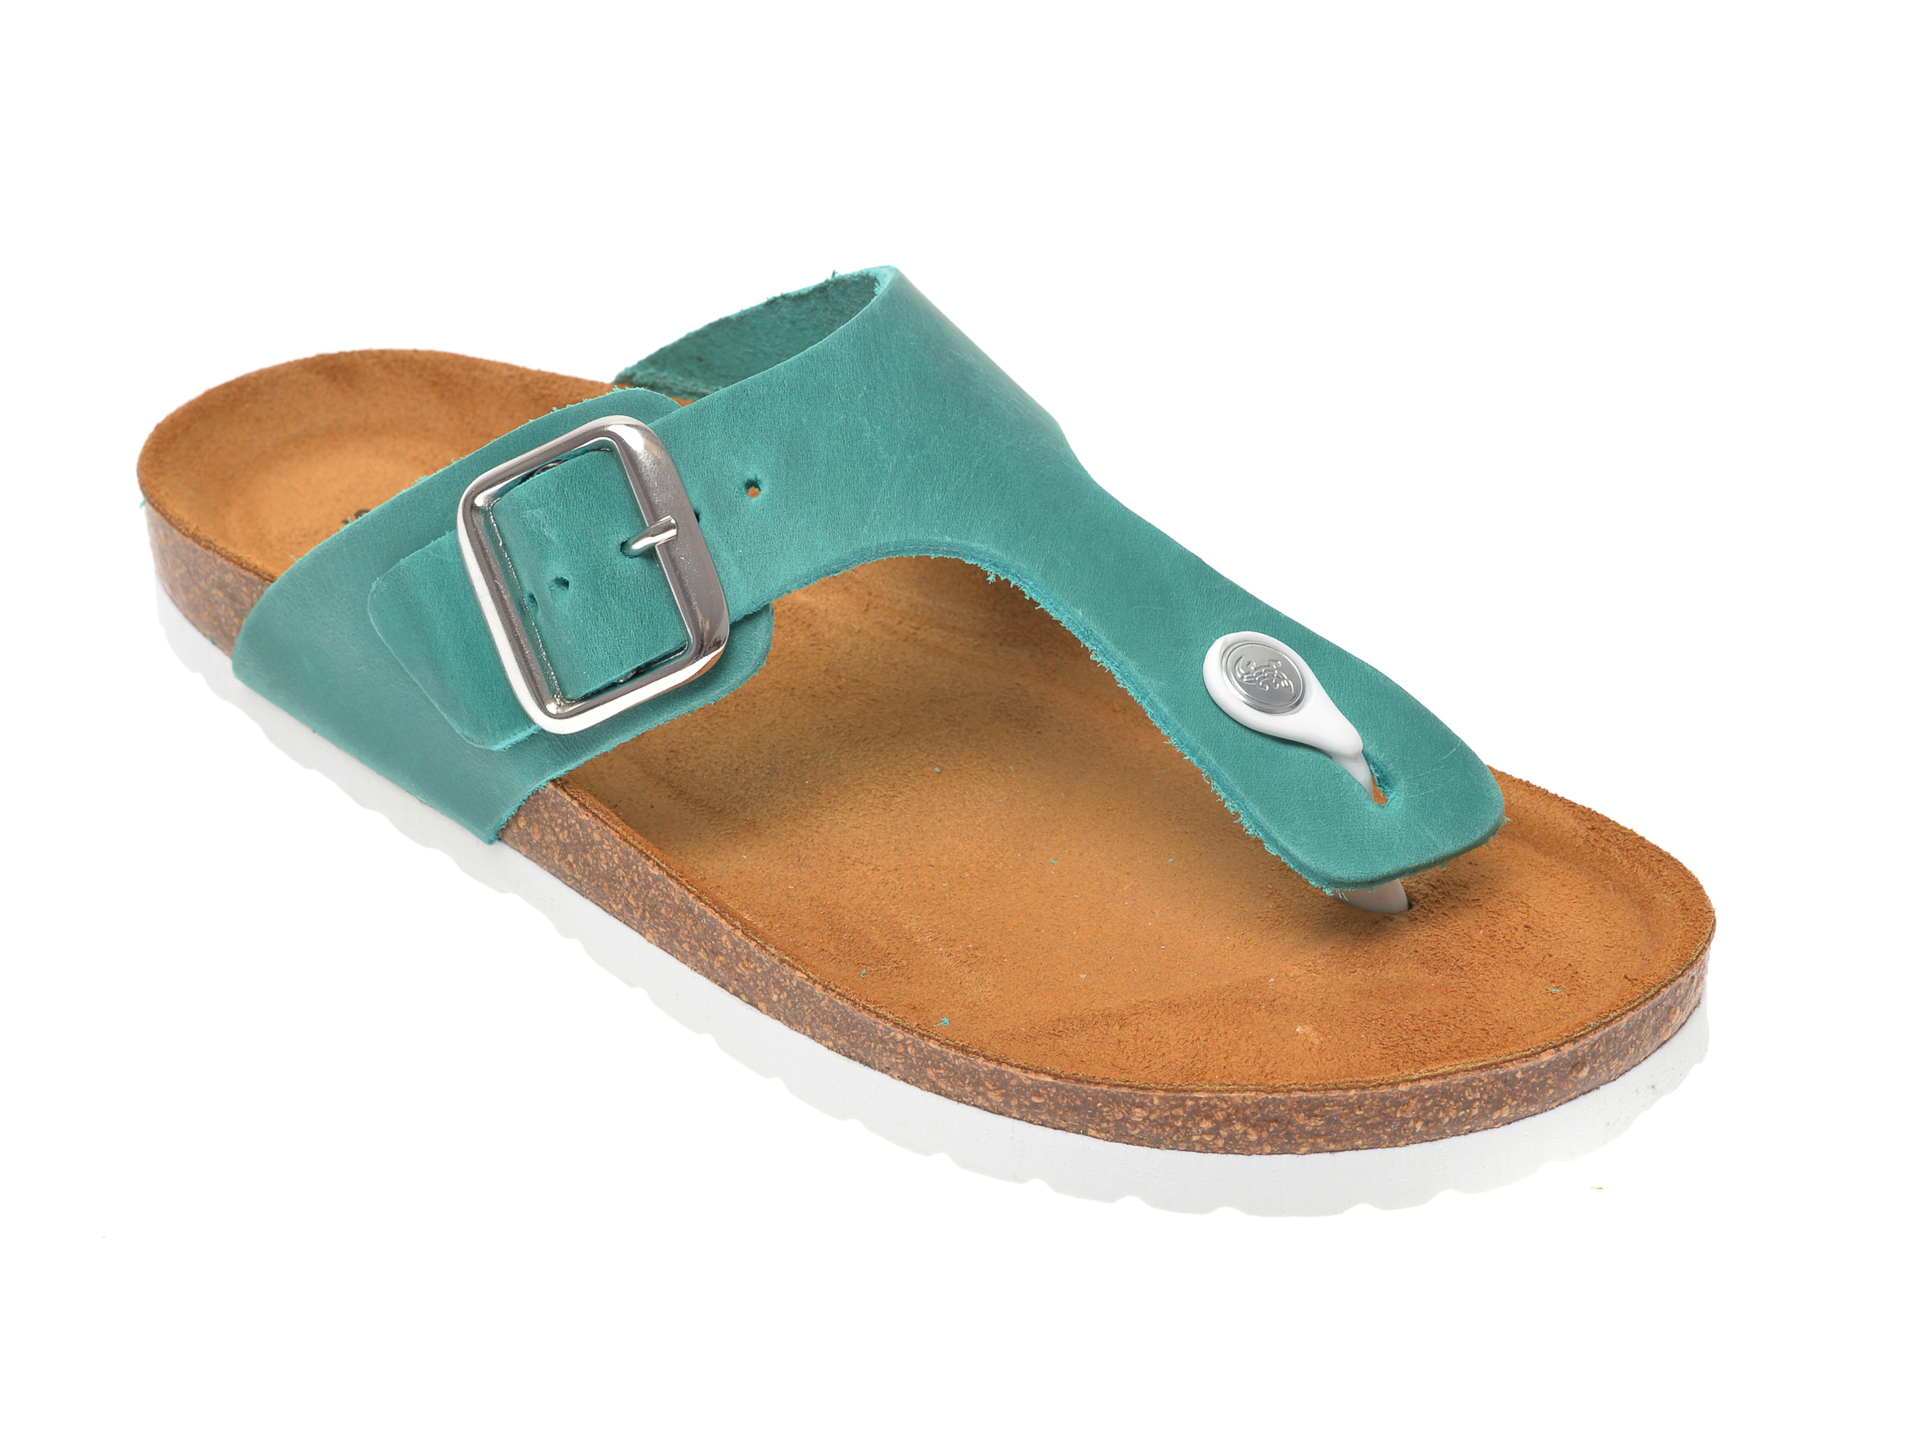 Papuci SALAMANDER verzi, 13014, din piele naturala